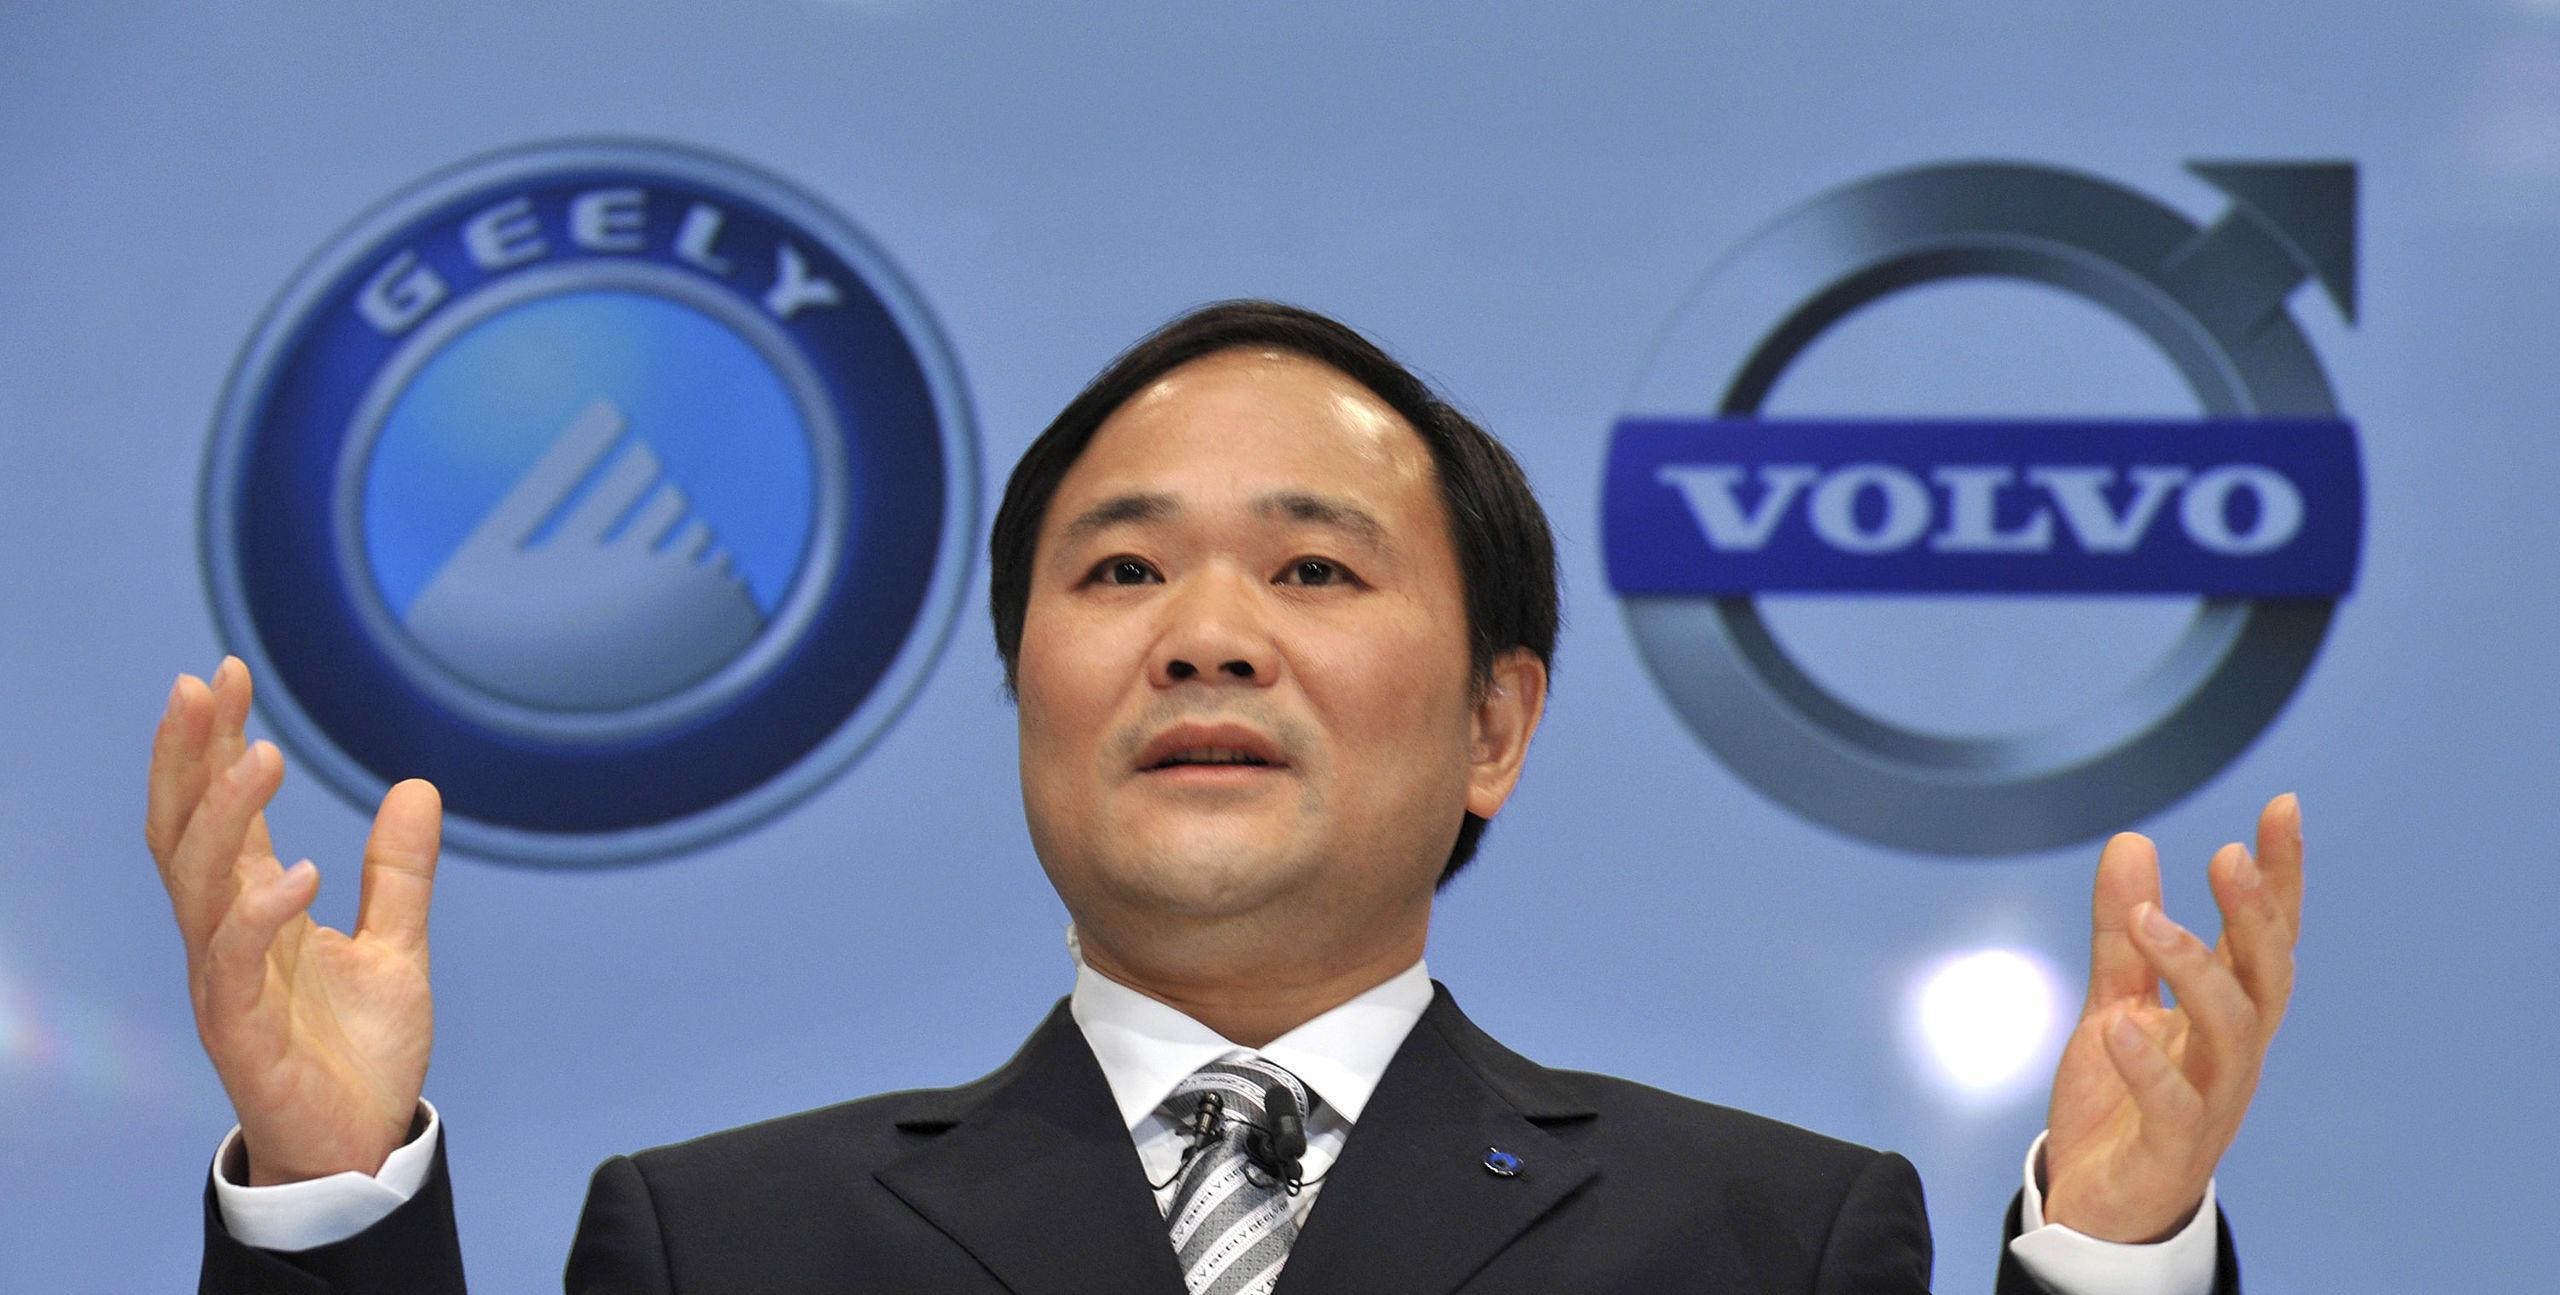 Volvo: Geely och Fredrik Lundberg oense om utdelning - DI